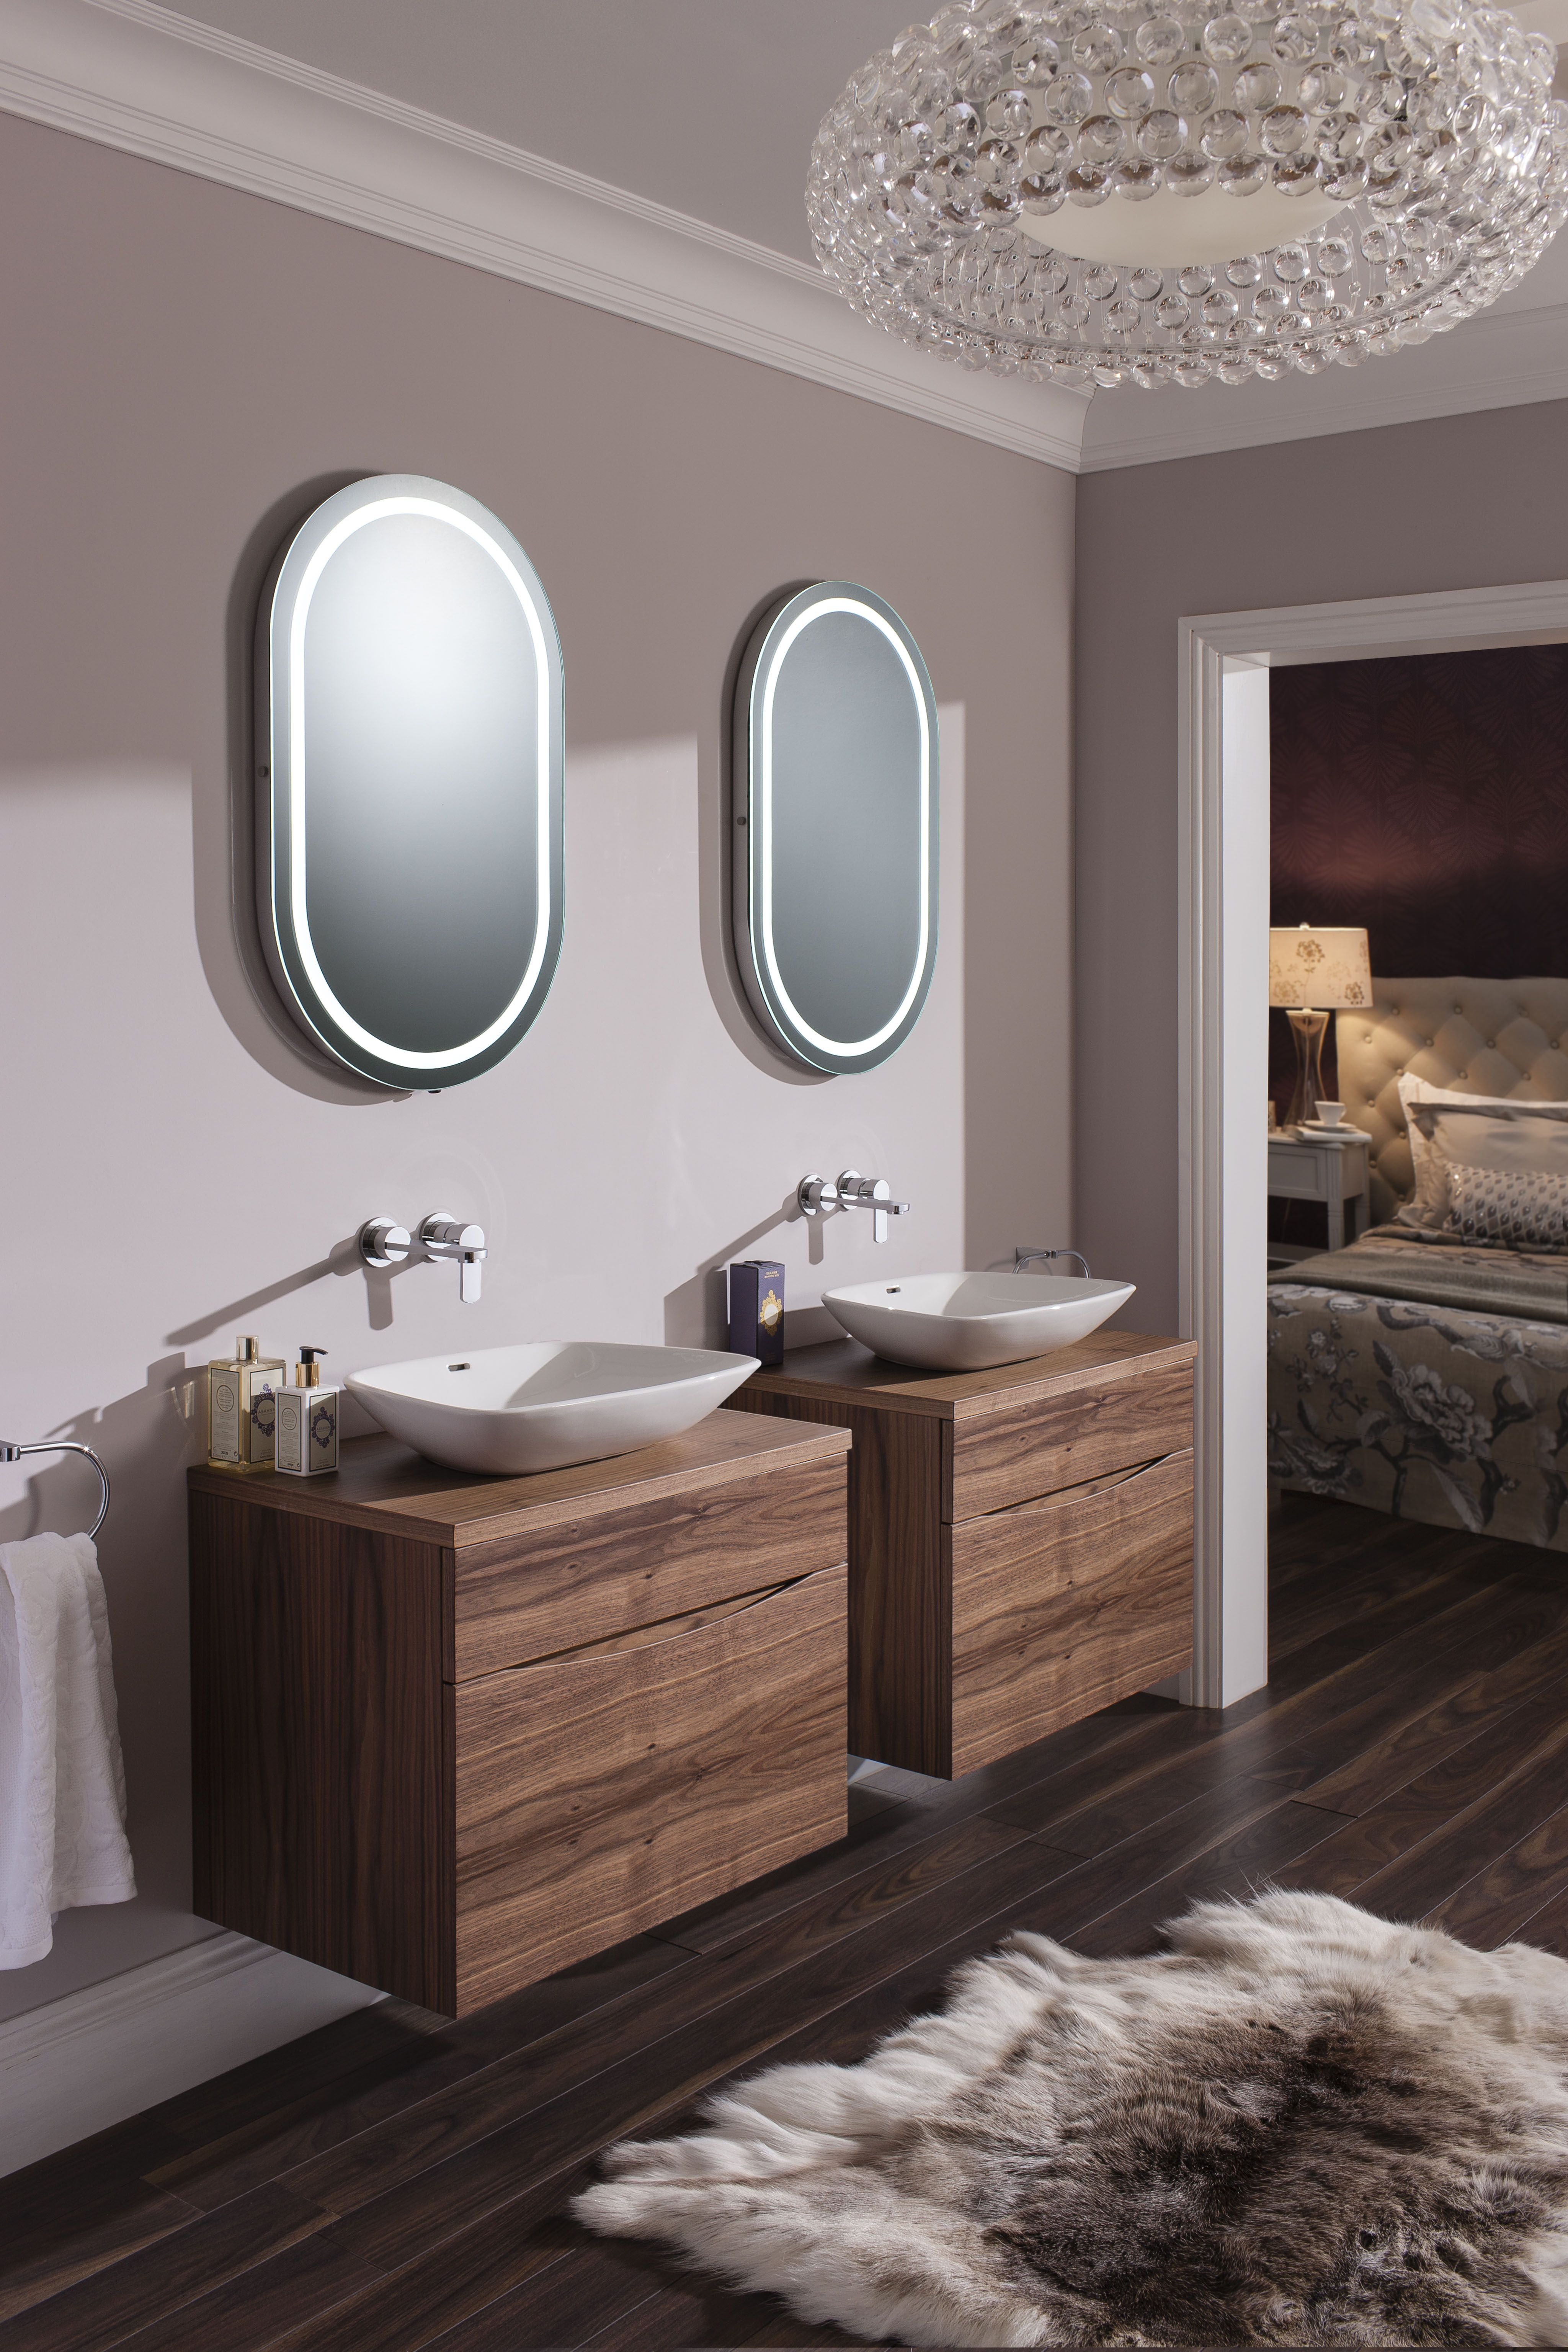 Glide Ii American Walnut Bathroom Furniture Range From Crosswater Http Www Bauhaus Bathrooms Co Uk Category Glide Ii American Walnut Badezimmer Bad Baden